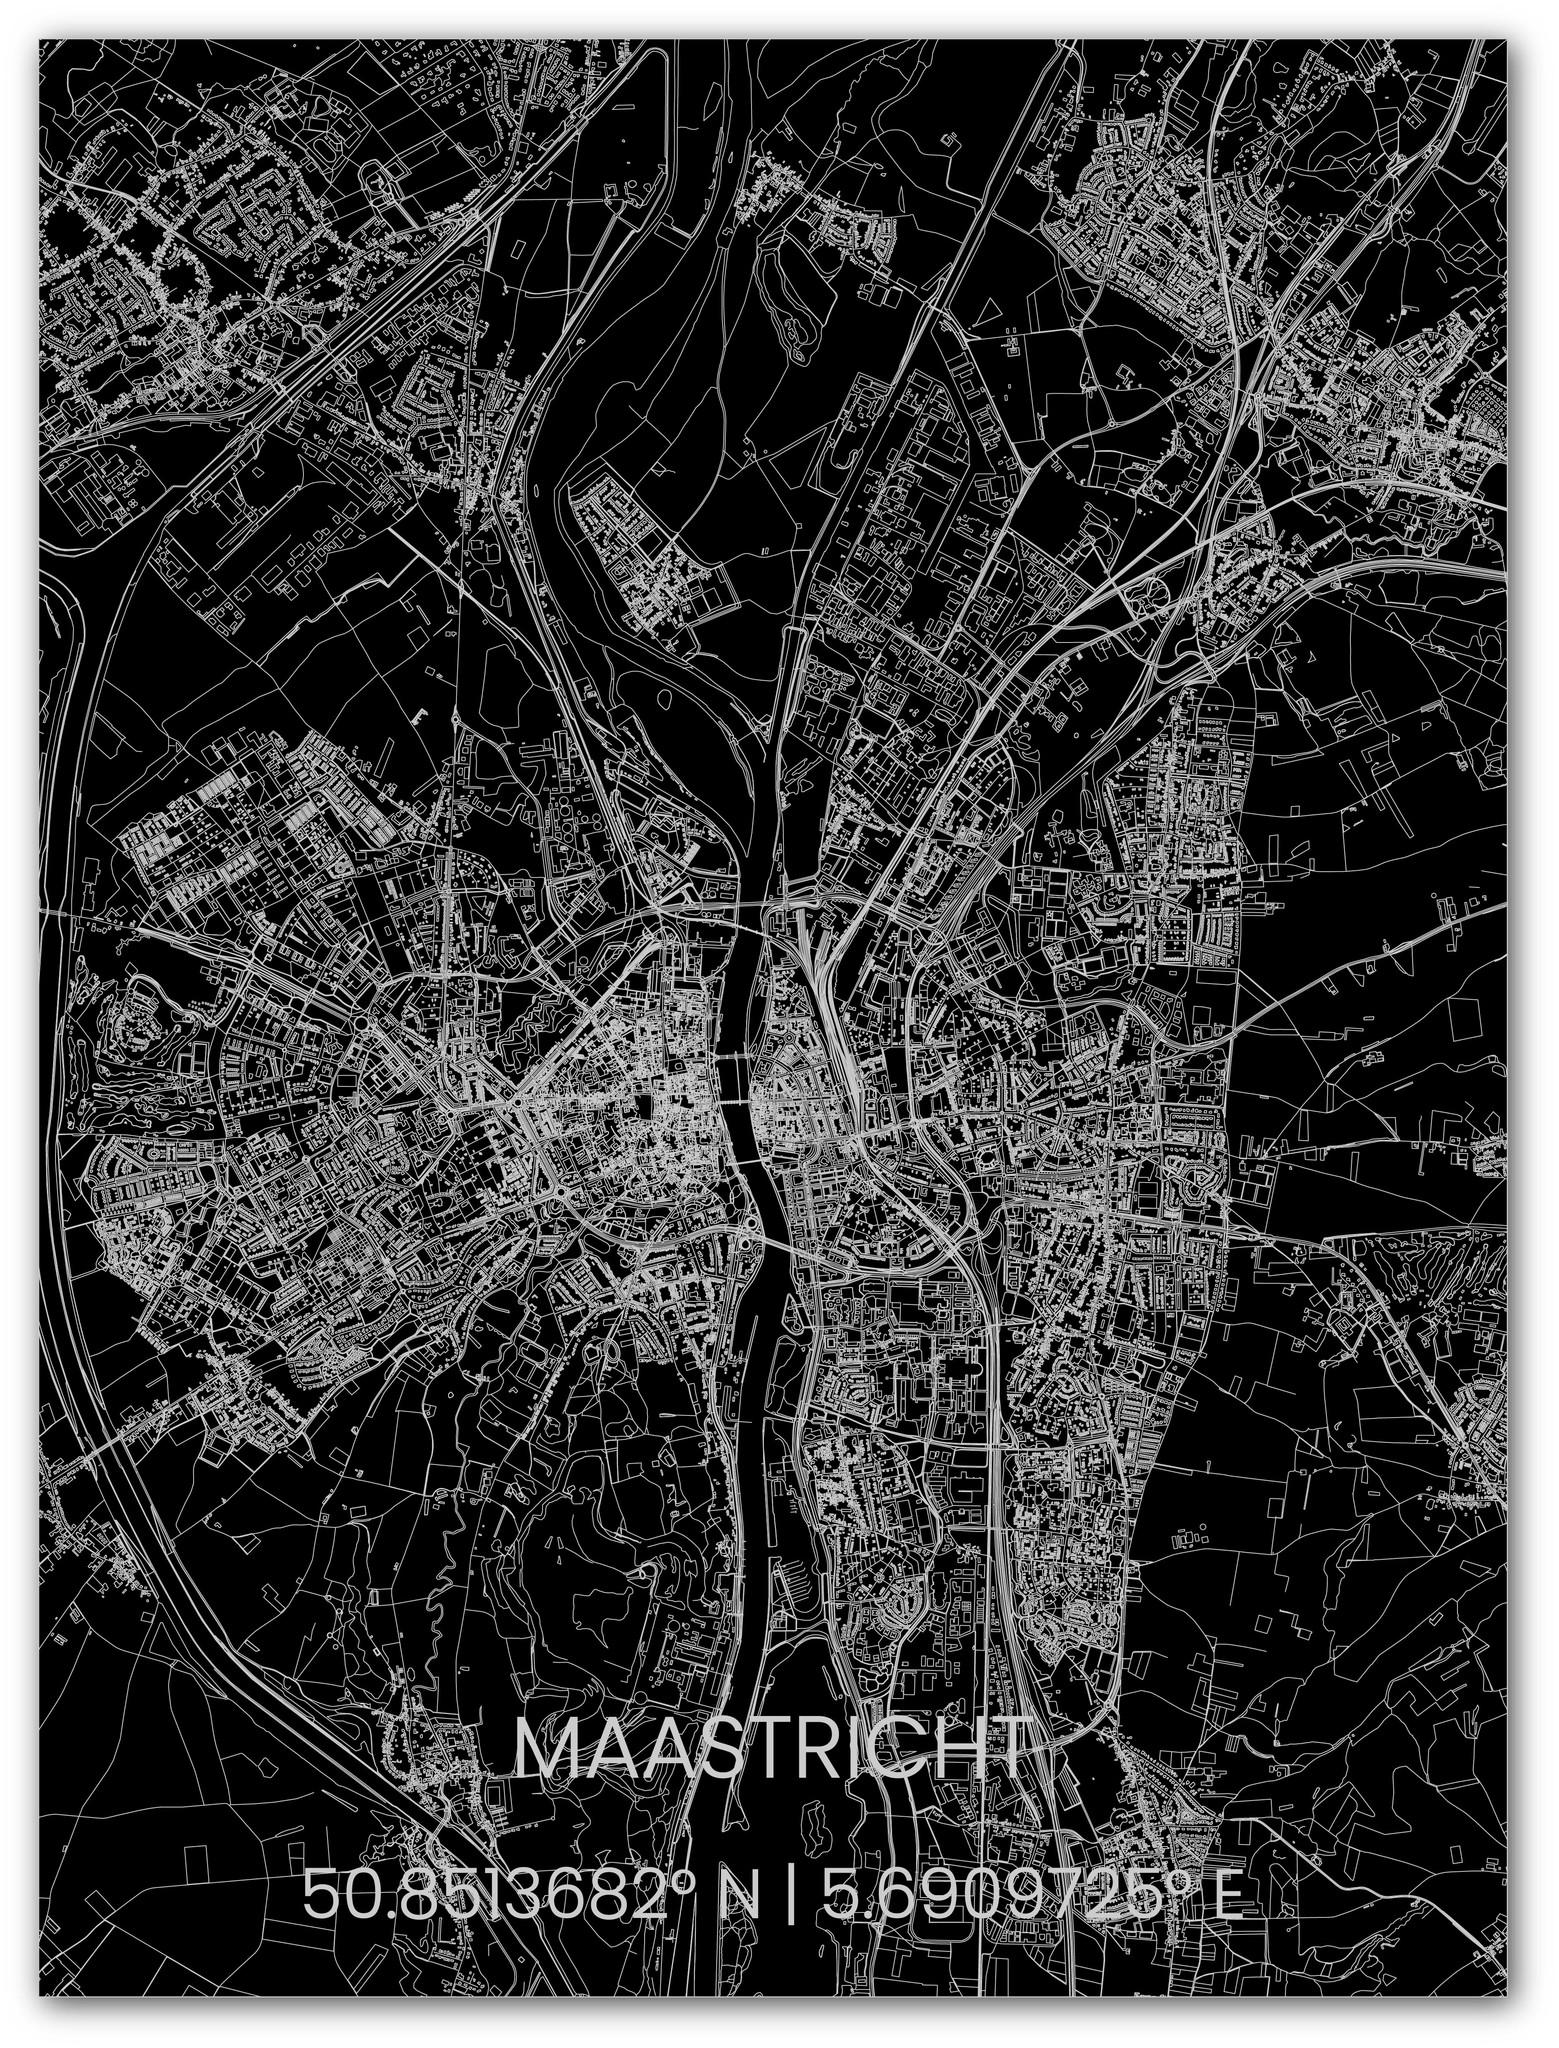 Metalen stadsplattegrond Maastricht-1